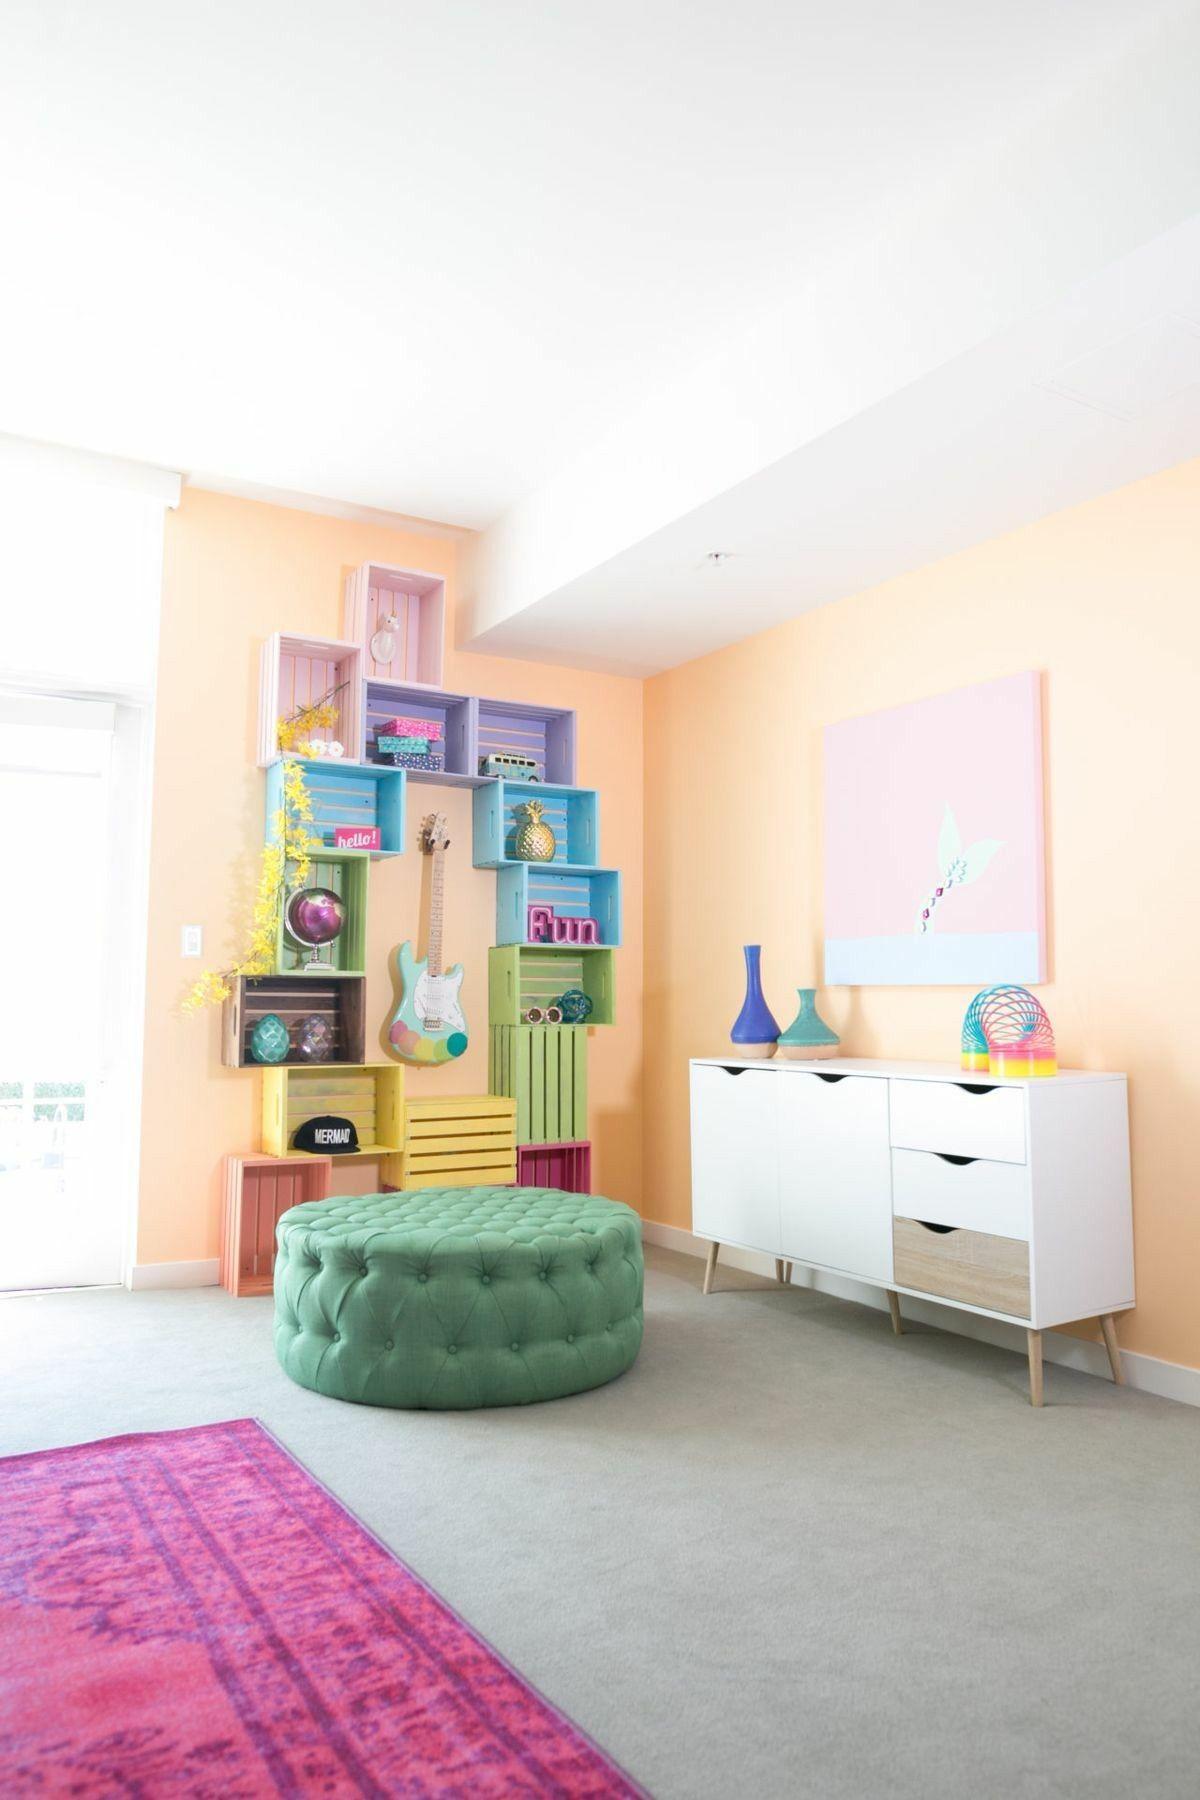 kids playroom with images  unicorn room decor rainbow